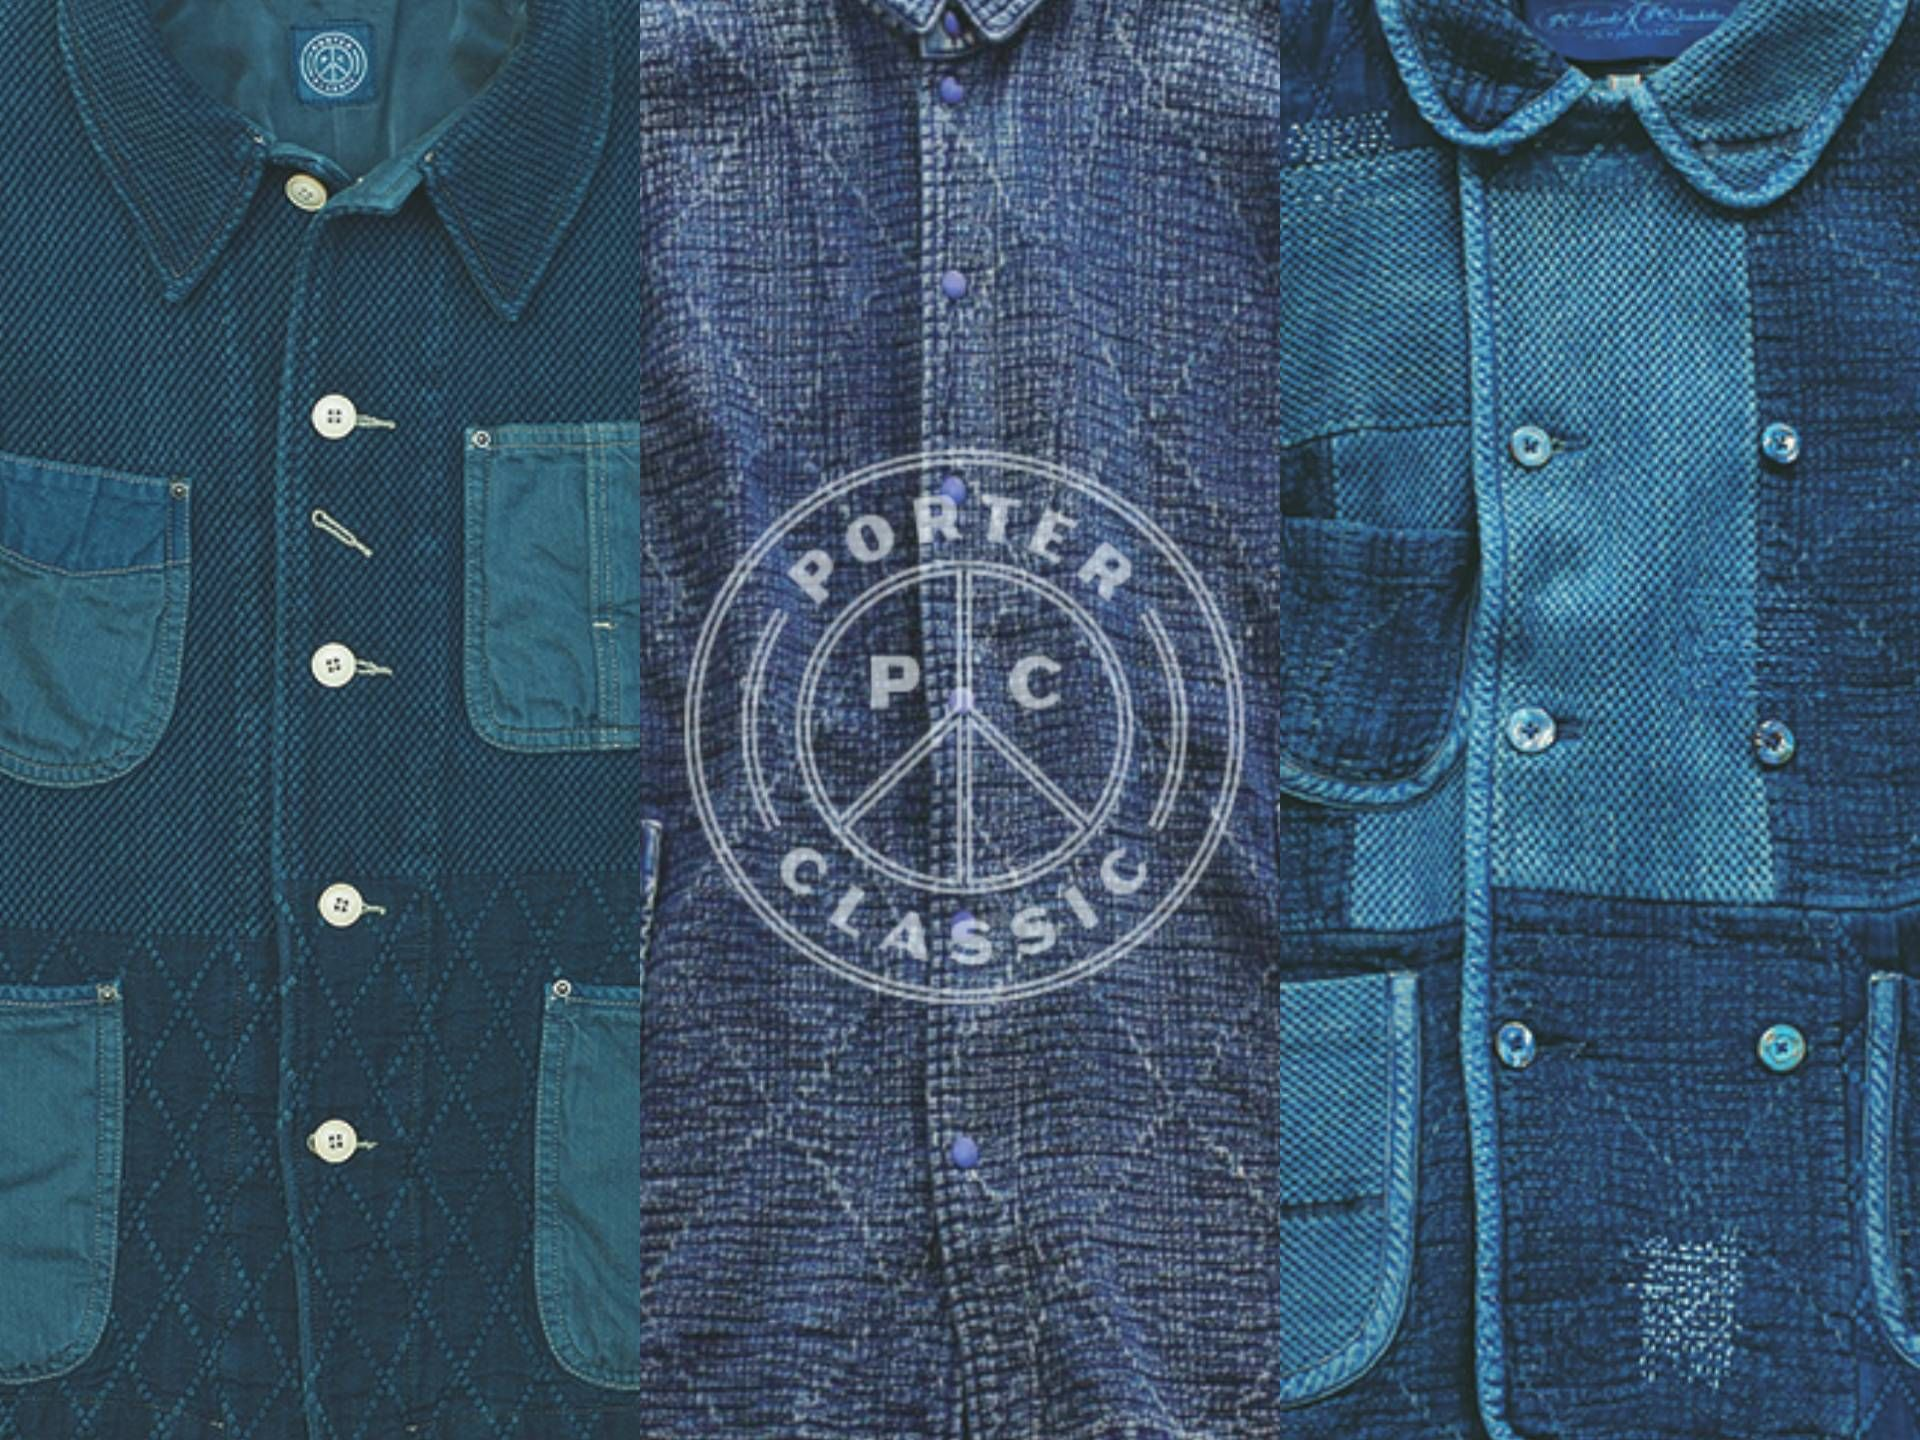 PORTER CLASSIC(ポータークラシック)